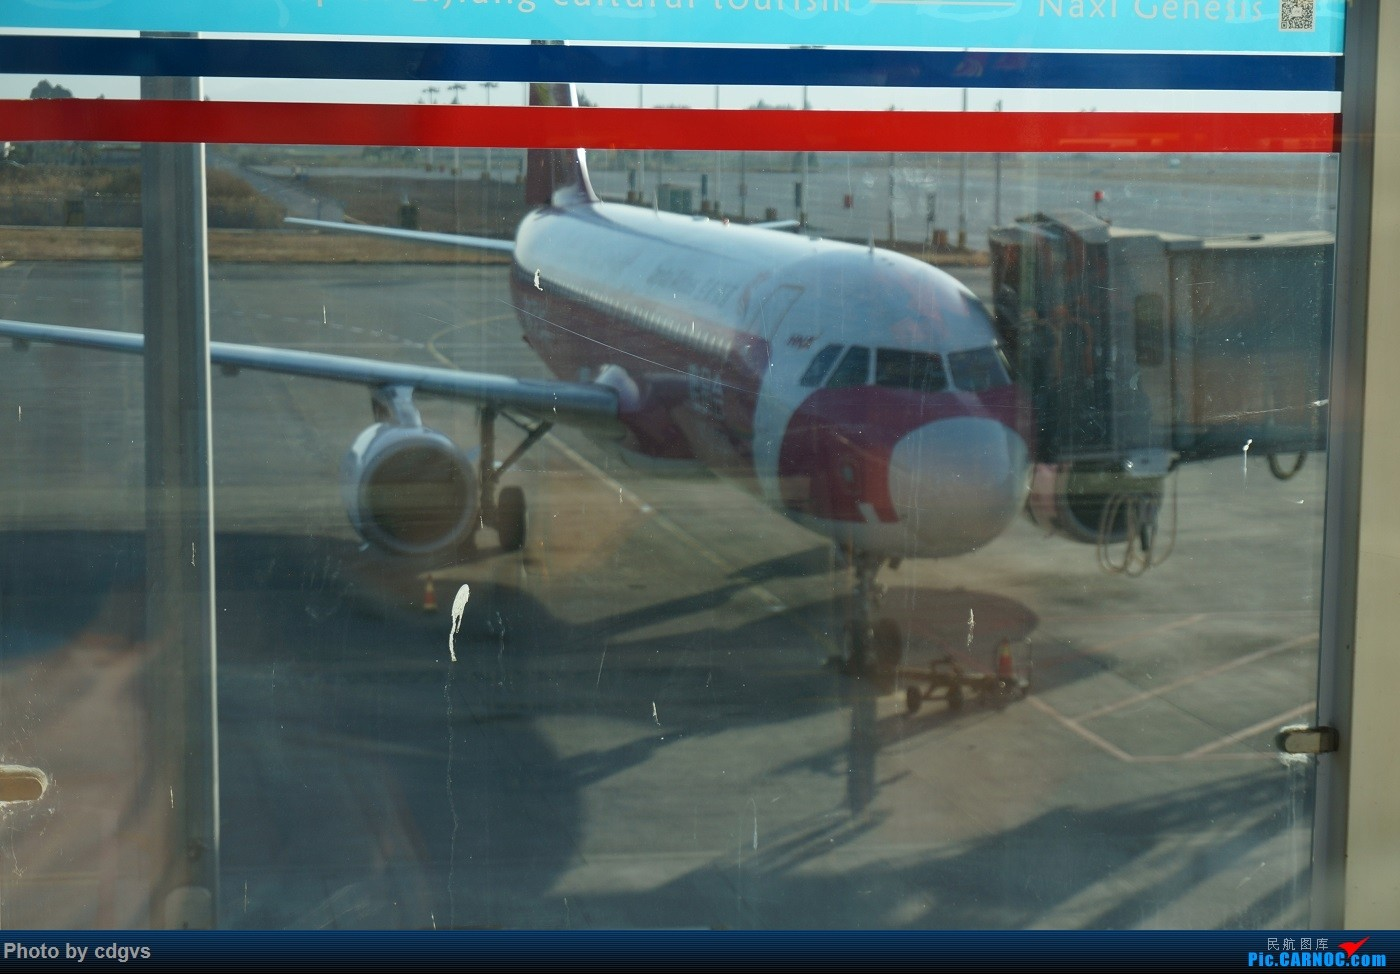 Re:KMG-LJG-KMG 东航&南航 省内刷航段,飞空客波音两种不同机型 AIRBUS A320-200 B-1621 中国丽江三义机场